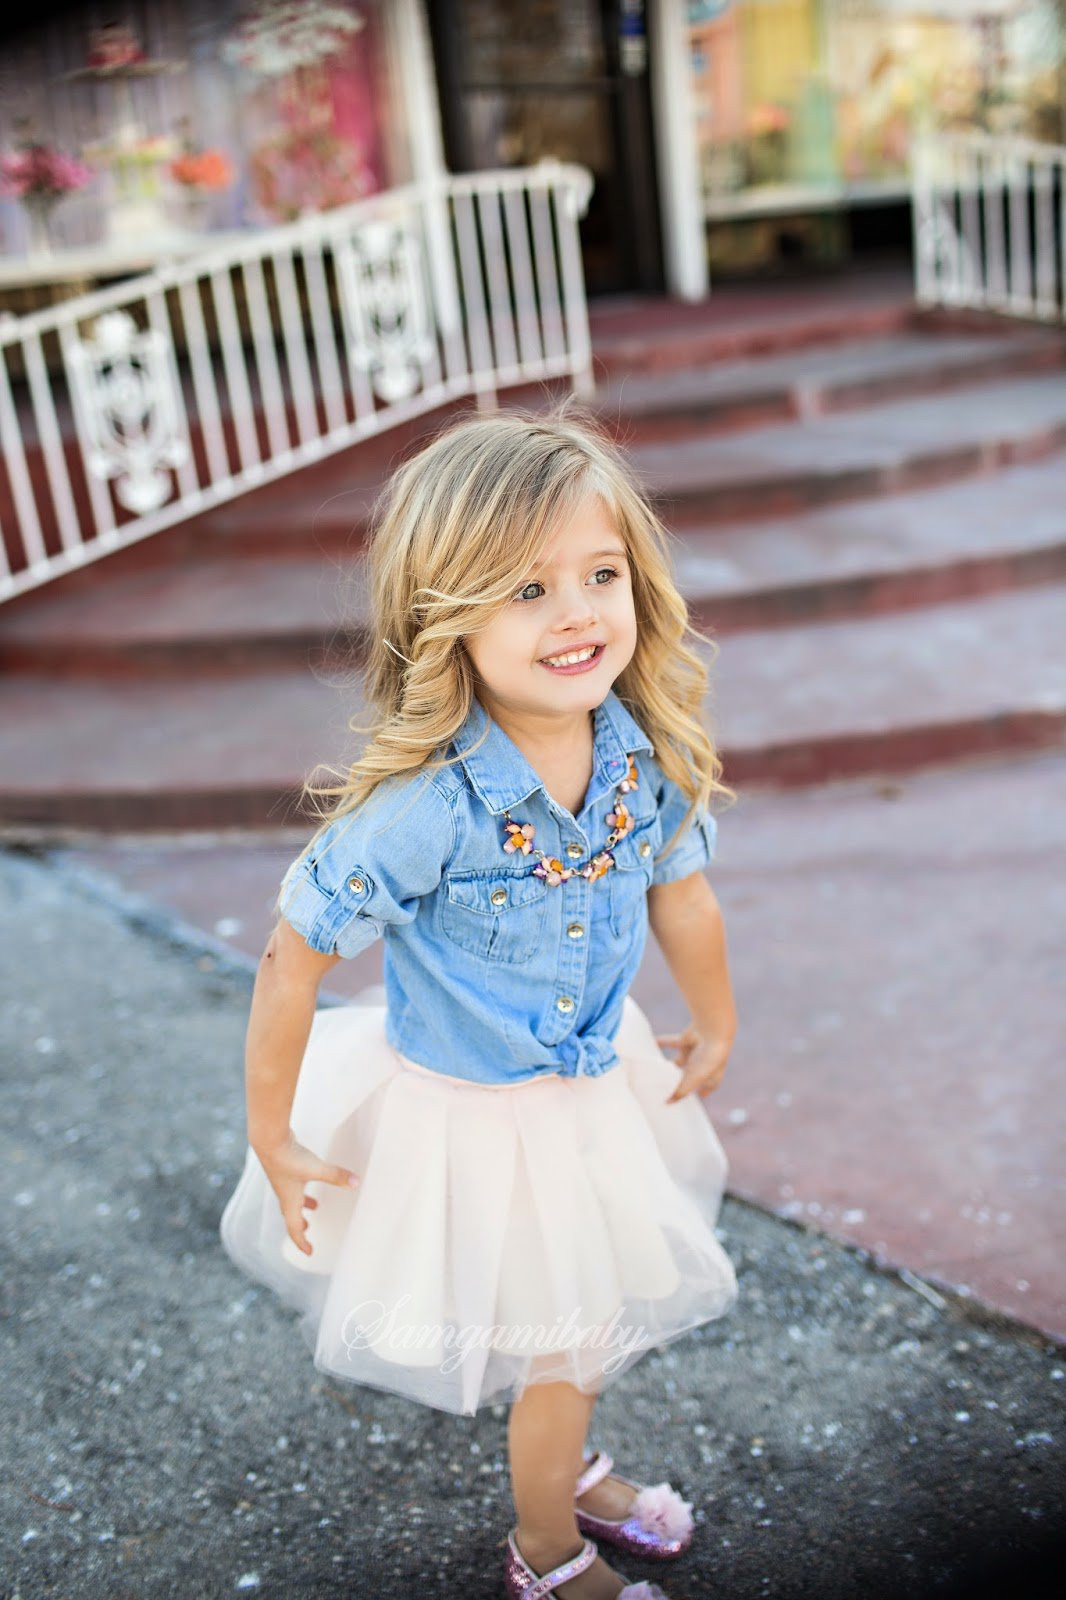 Mother Daughter Denim Dresses Like Mum Mom And Daughter Dress Summer Auntumn Style Family Look Denim T Shirt Top +tutu Skirt Y19051103